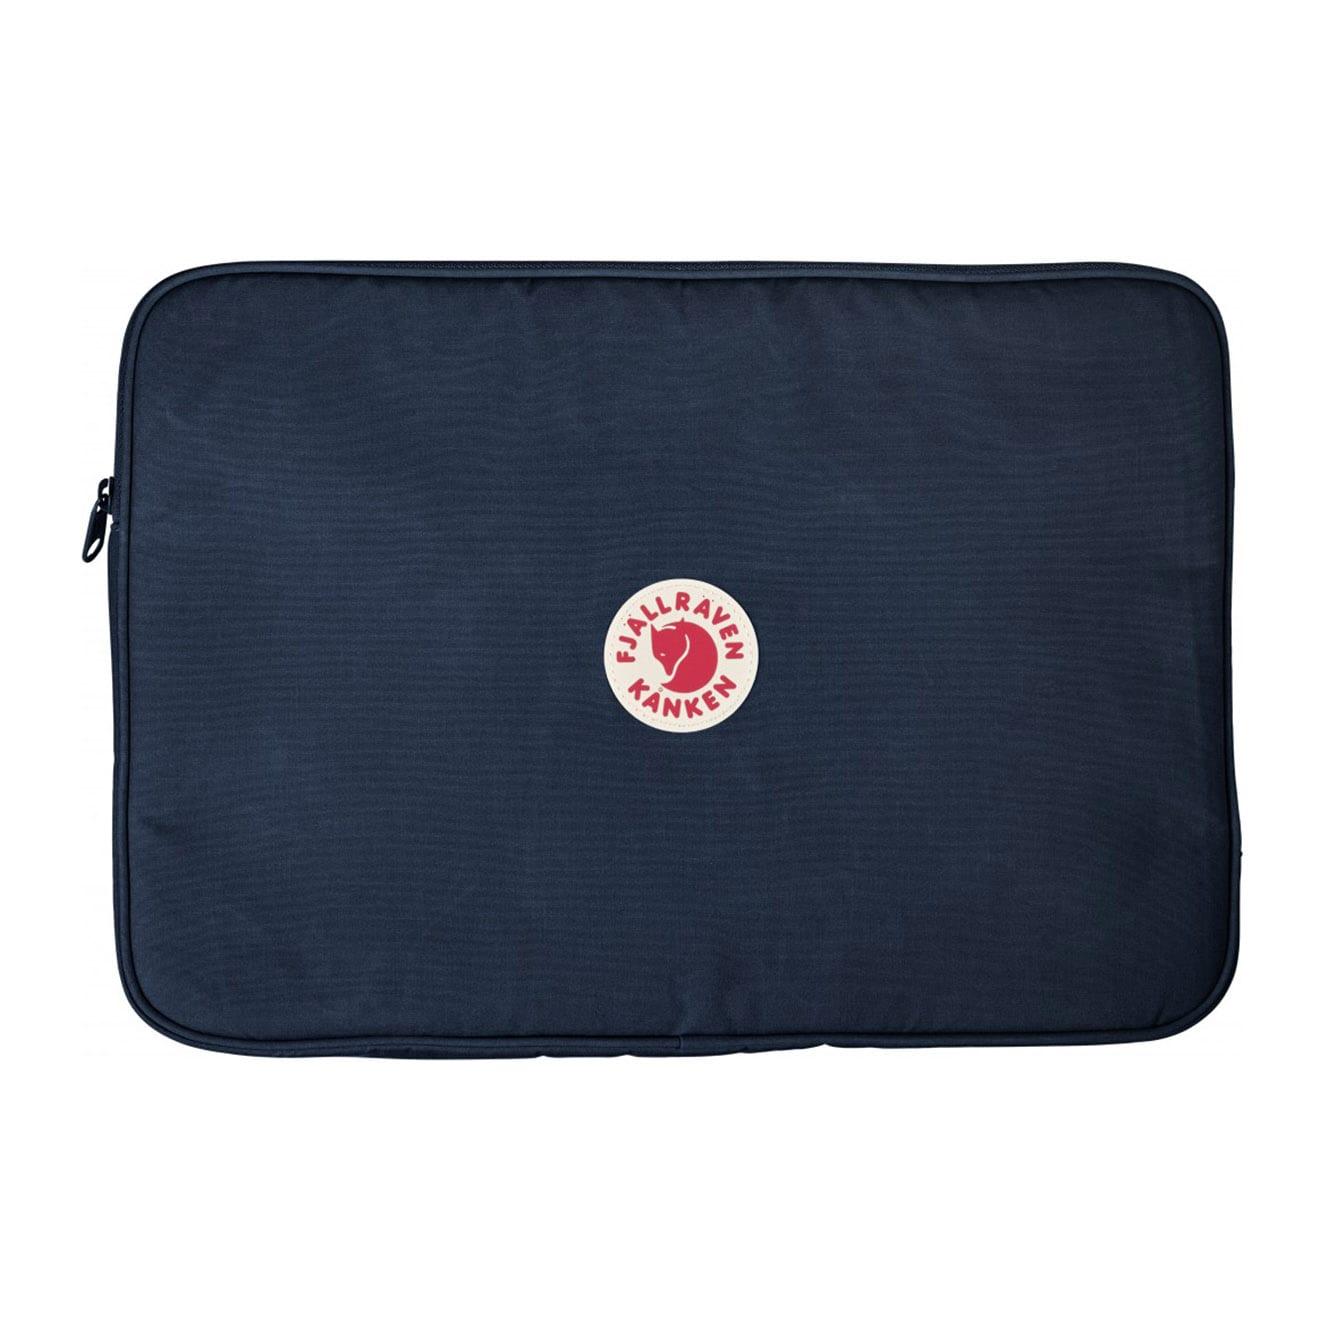 "Fjallraven Kanken 15"" Laptop Case Navy"